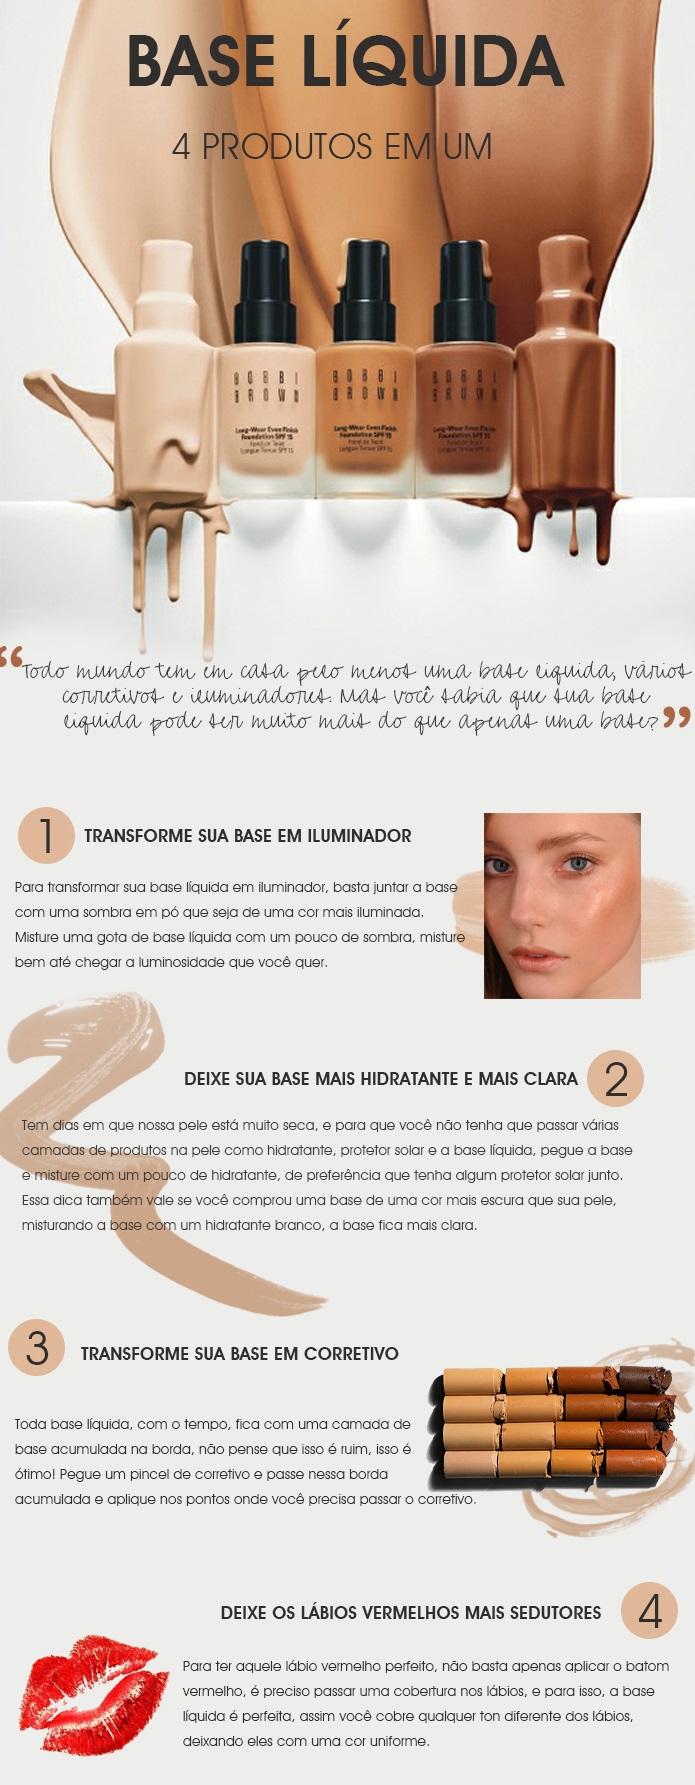 How-to-beleza-dicas-de-como-usar-a-base-líquida-como-iluminador-corretivo-e-deixar-a-base-mais-clara-blog-Meninait